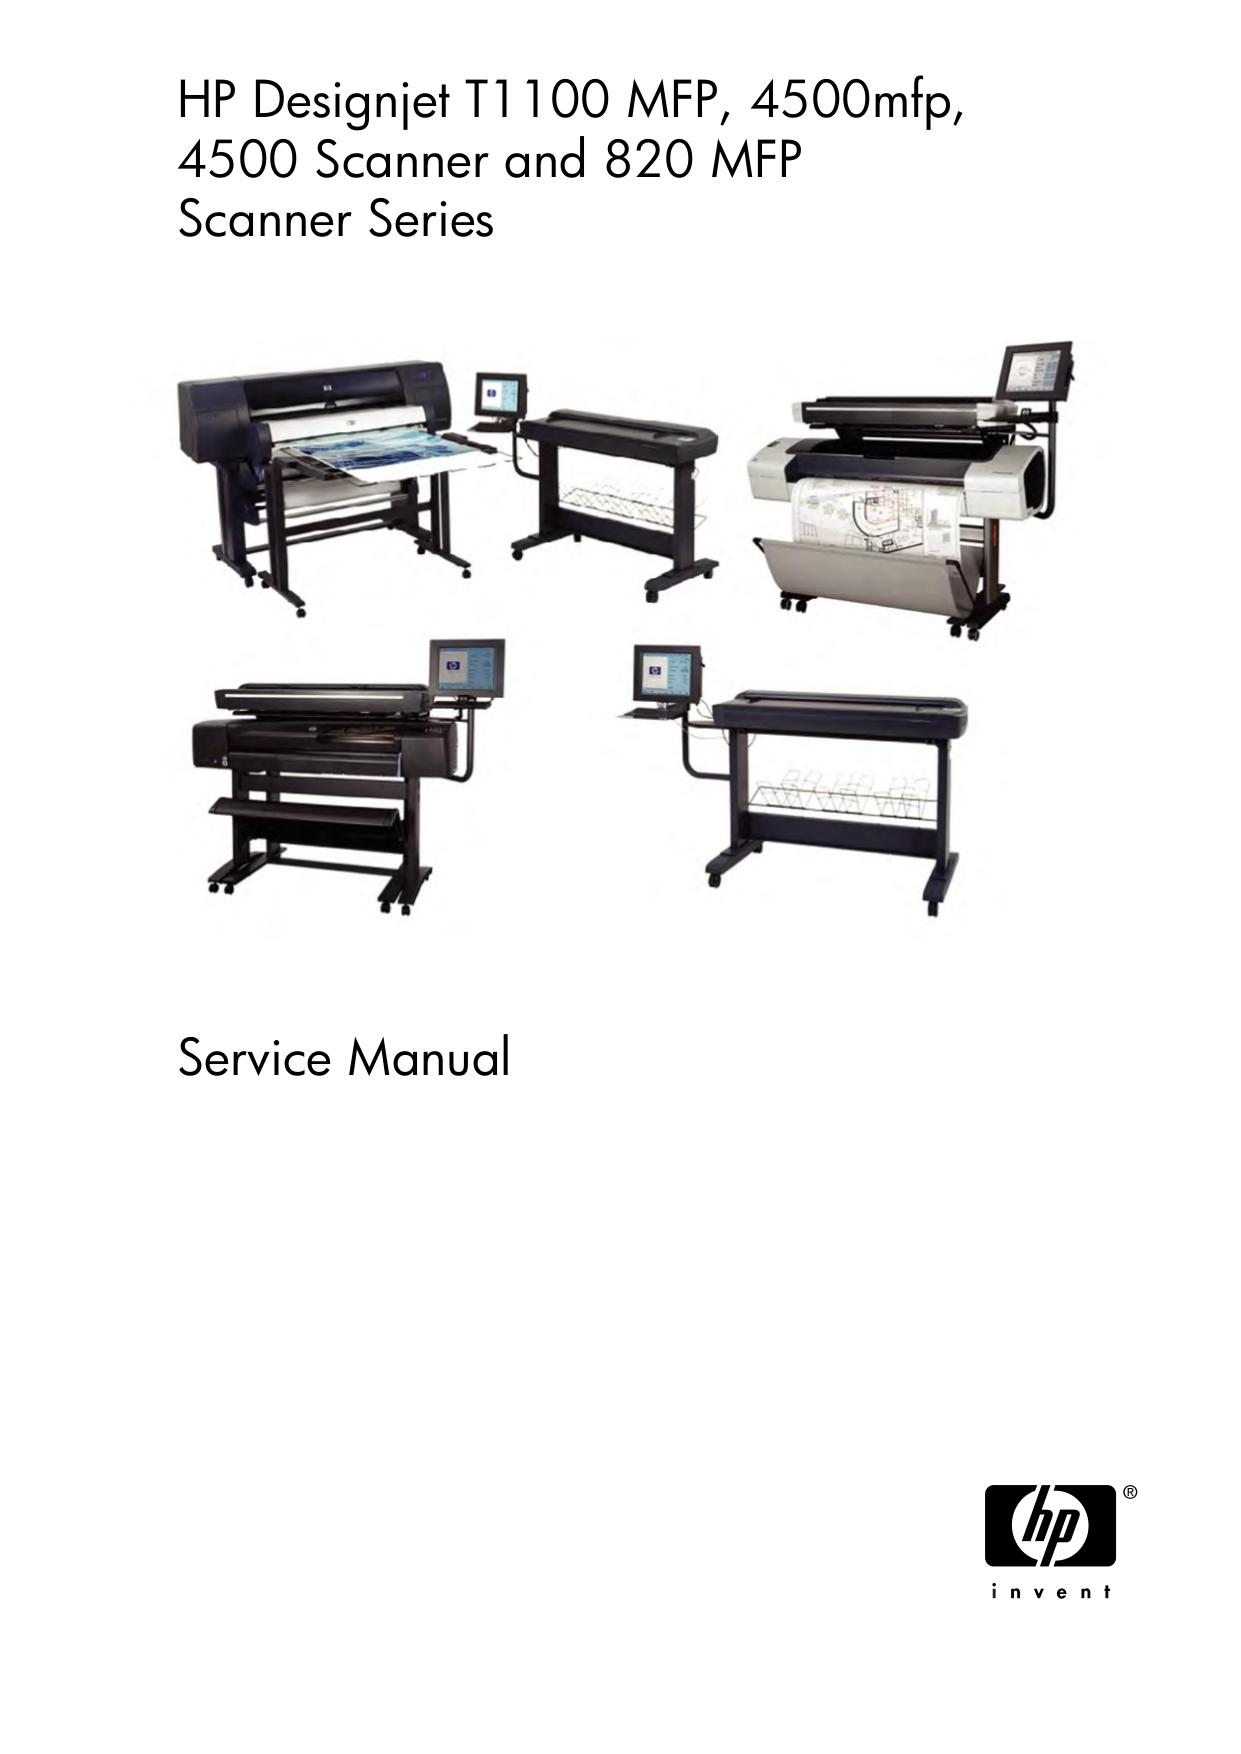 download free pdf for hp designjet 820 mfp multifunction printer manual rh umlib com HP Designjet 750C hp designjet 820 mfp scanner manual